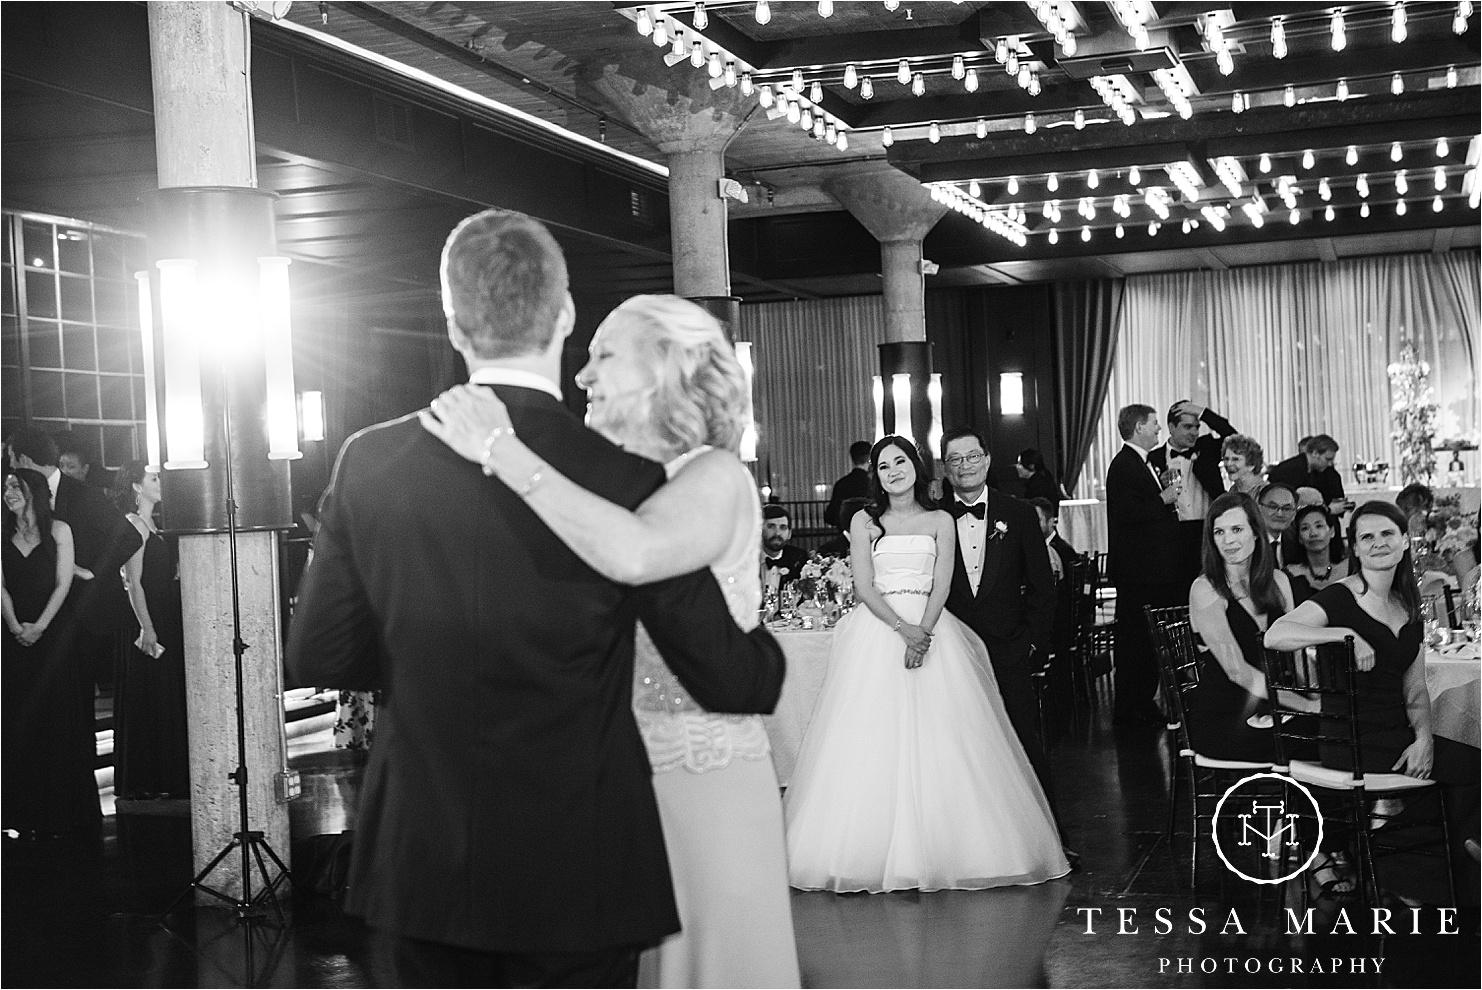 Tessa_marie_weddings_houston_wedding_photographer_The_astorian_0169.jpg